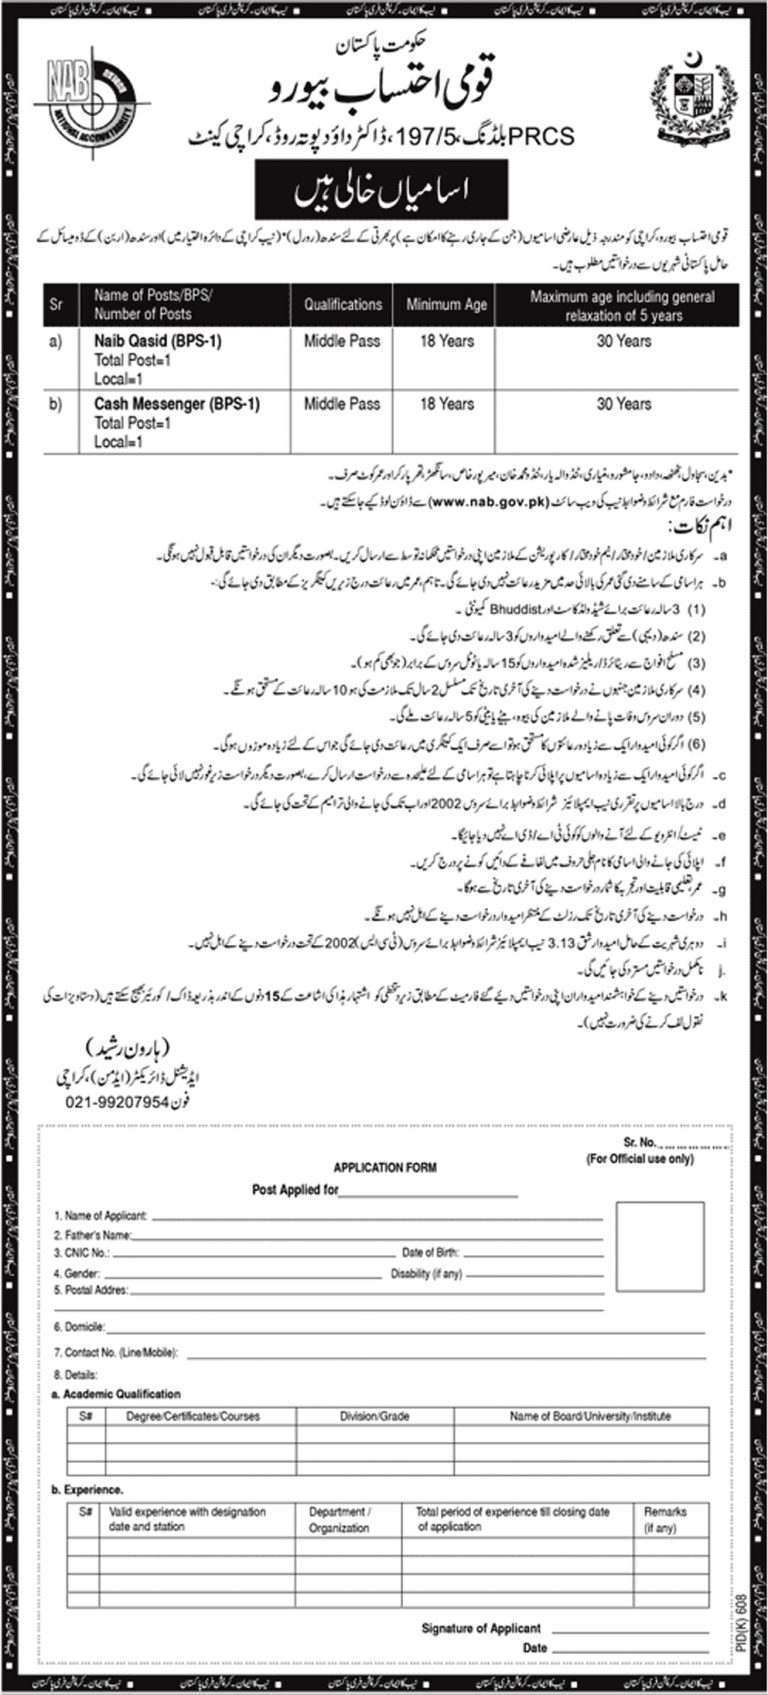 NAB Jobs 2019 Form Download National Accountability Bureau Karachi Latest Vacancies